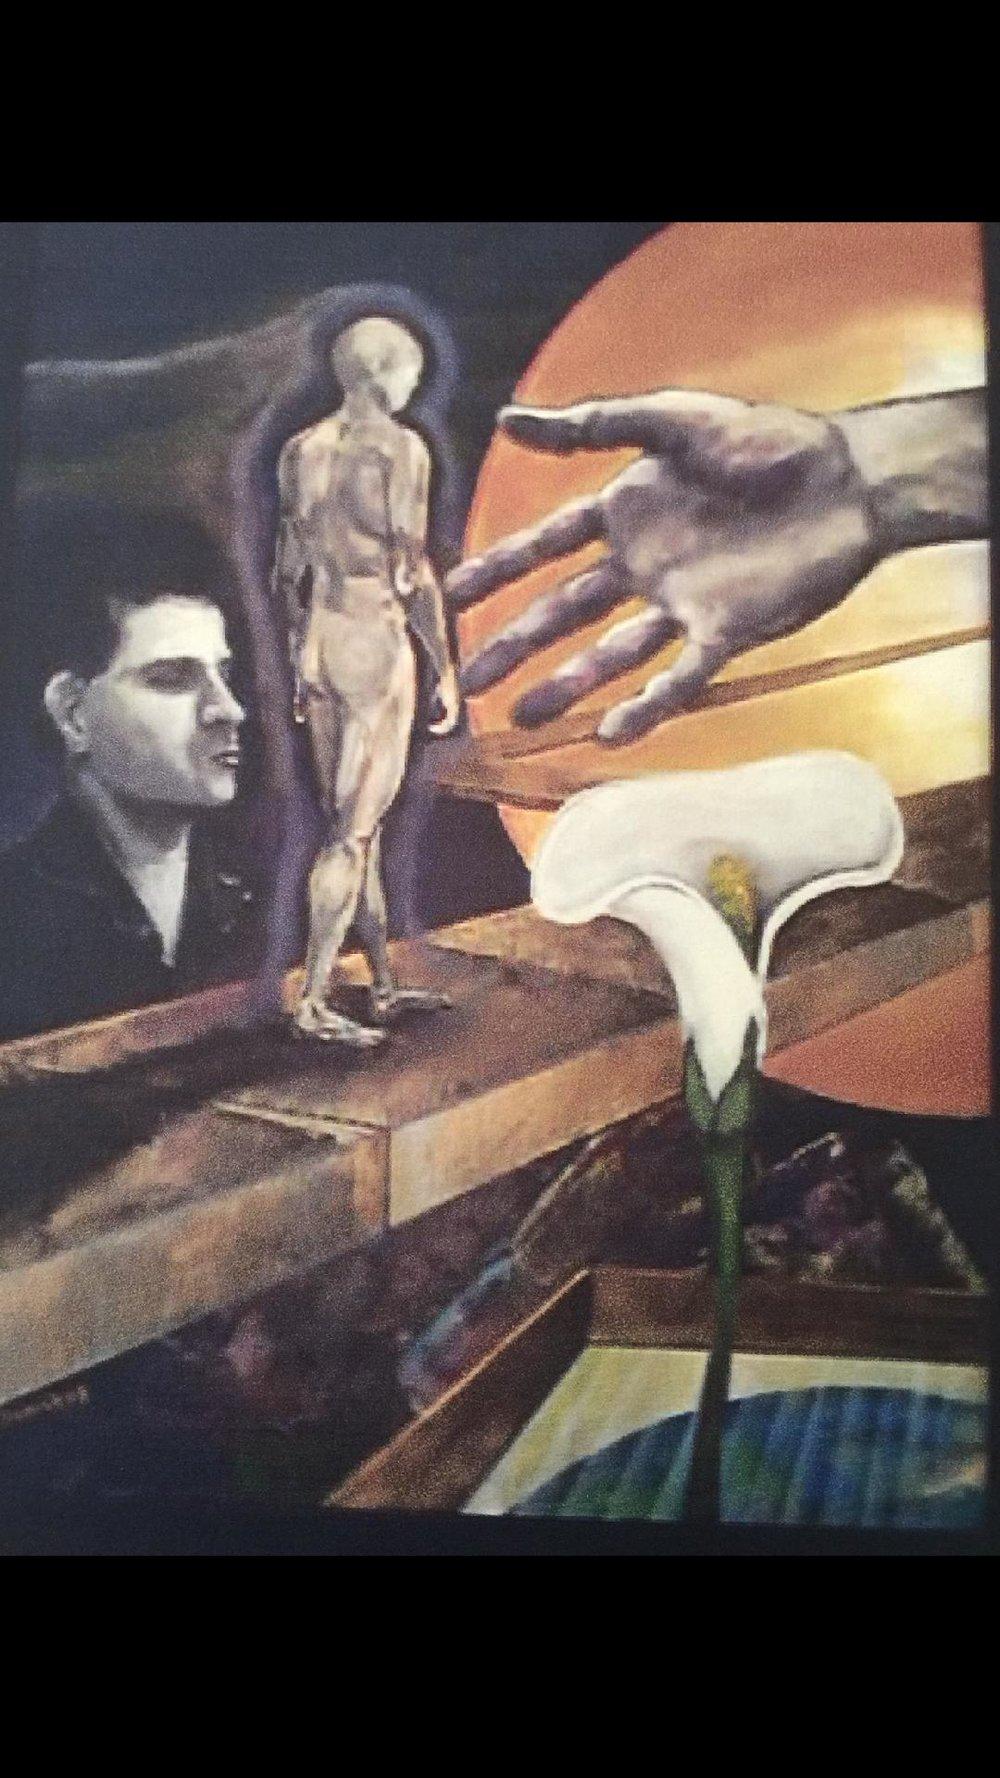 Christakos CrossingOver - David Christakos.jpeg